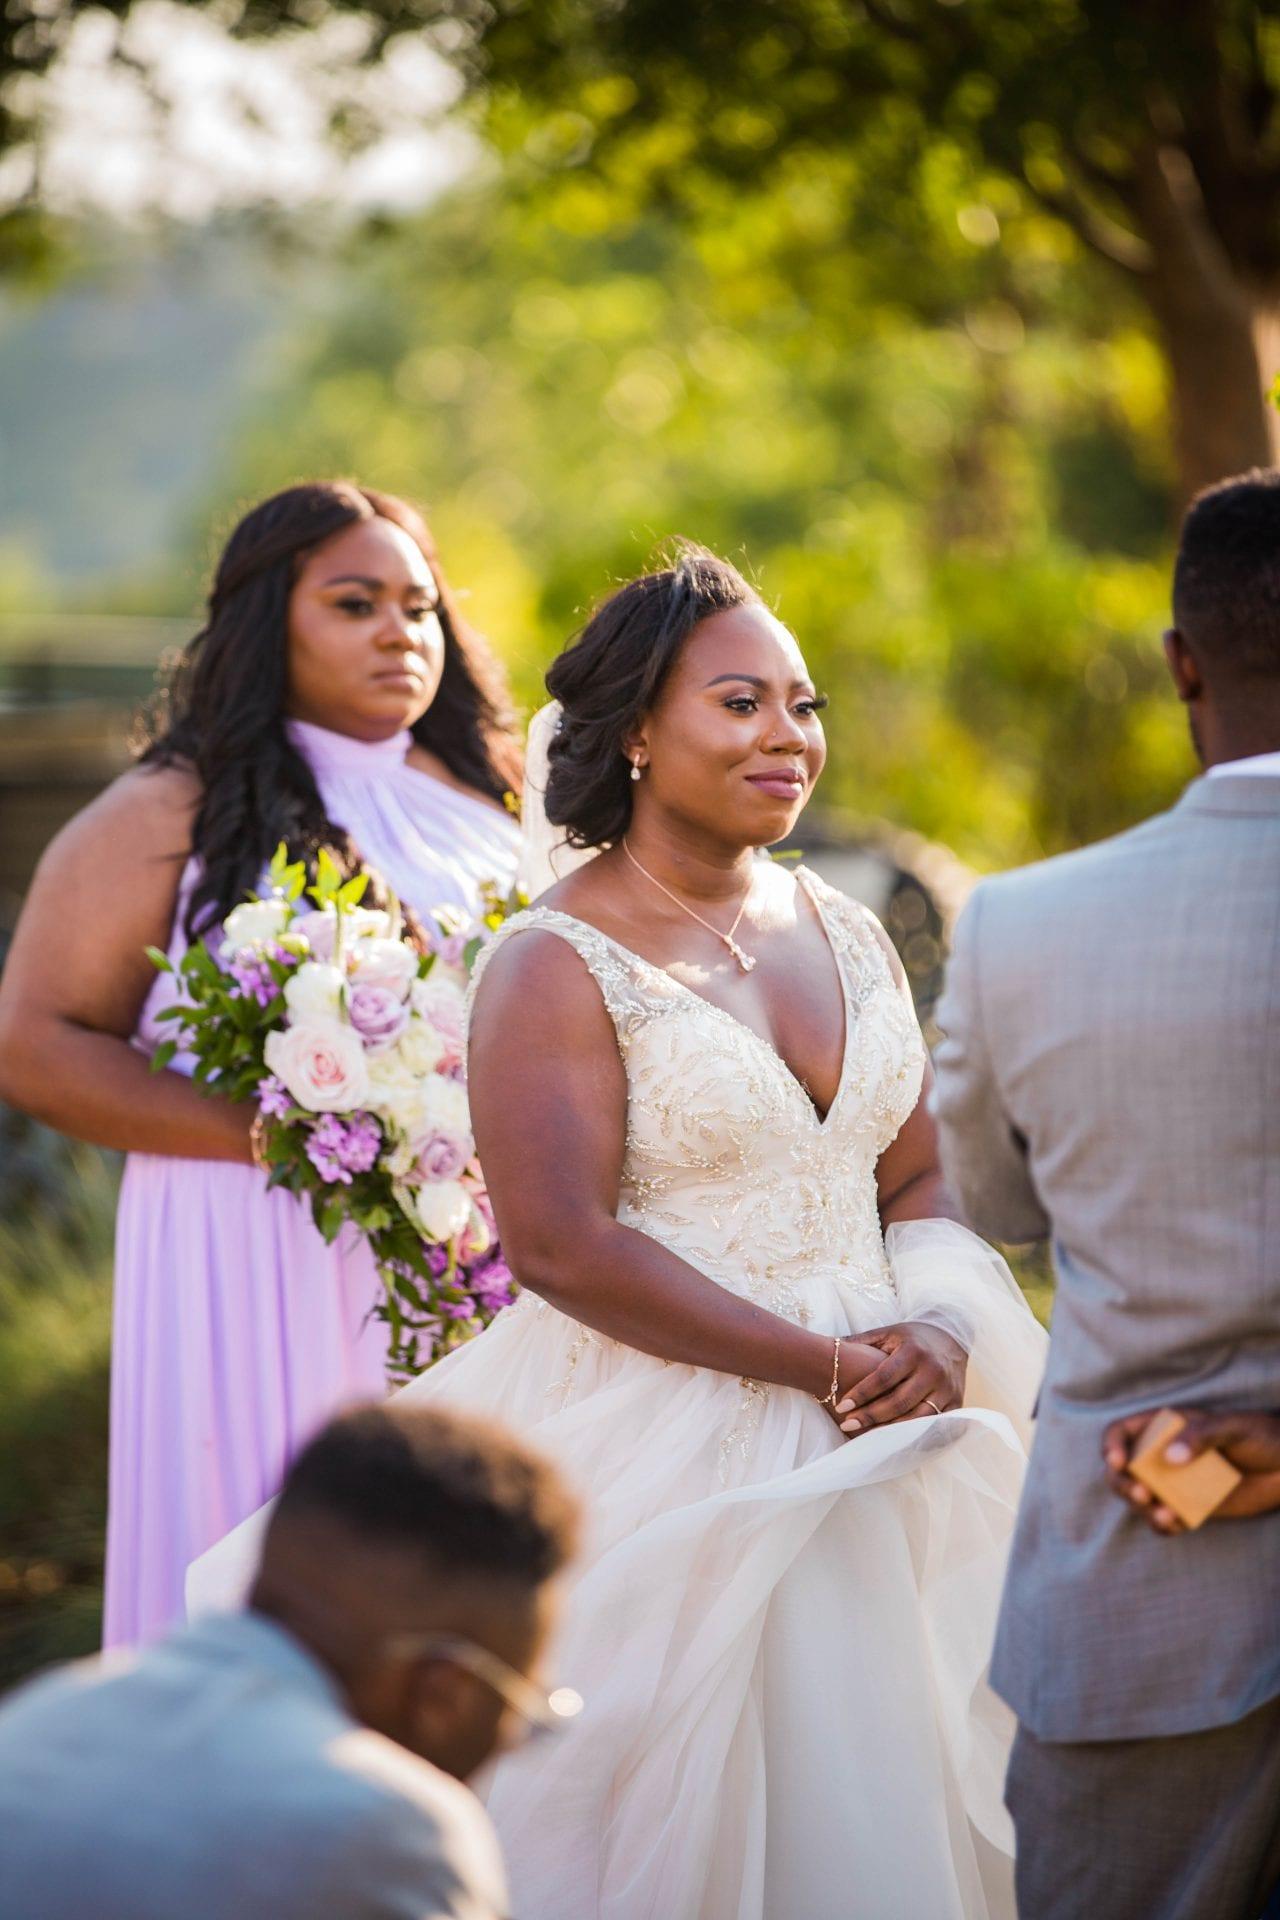 Onyema wedding La Cantera brides vows her face